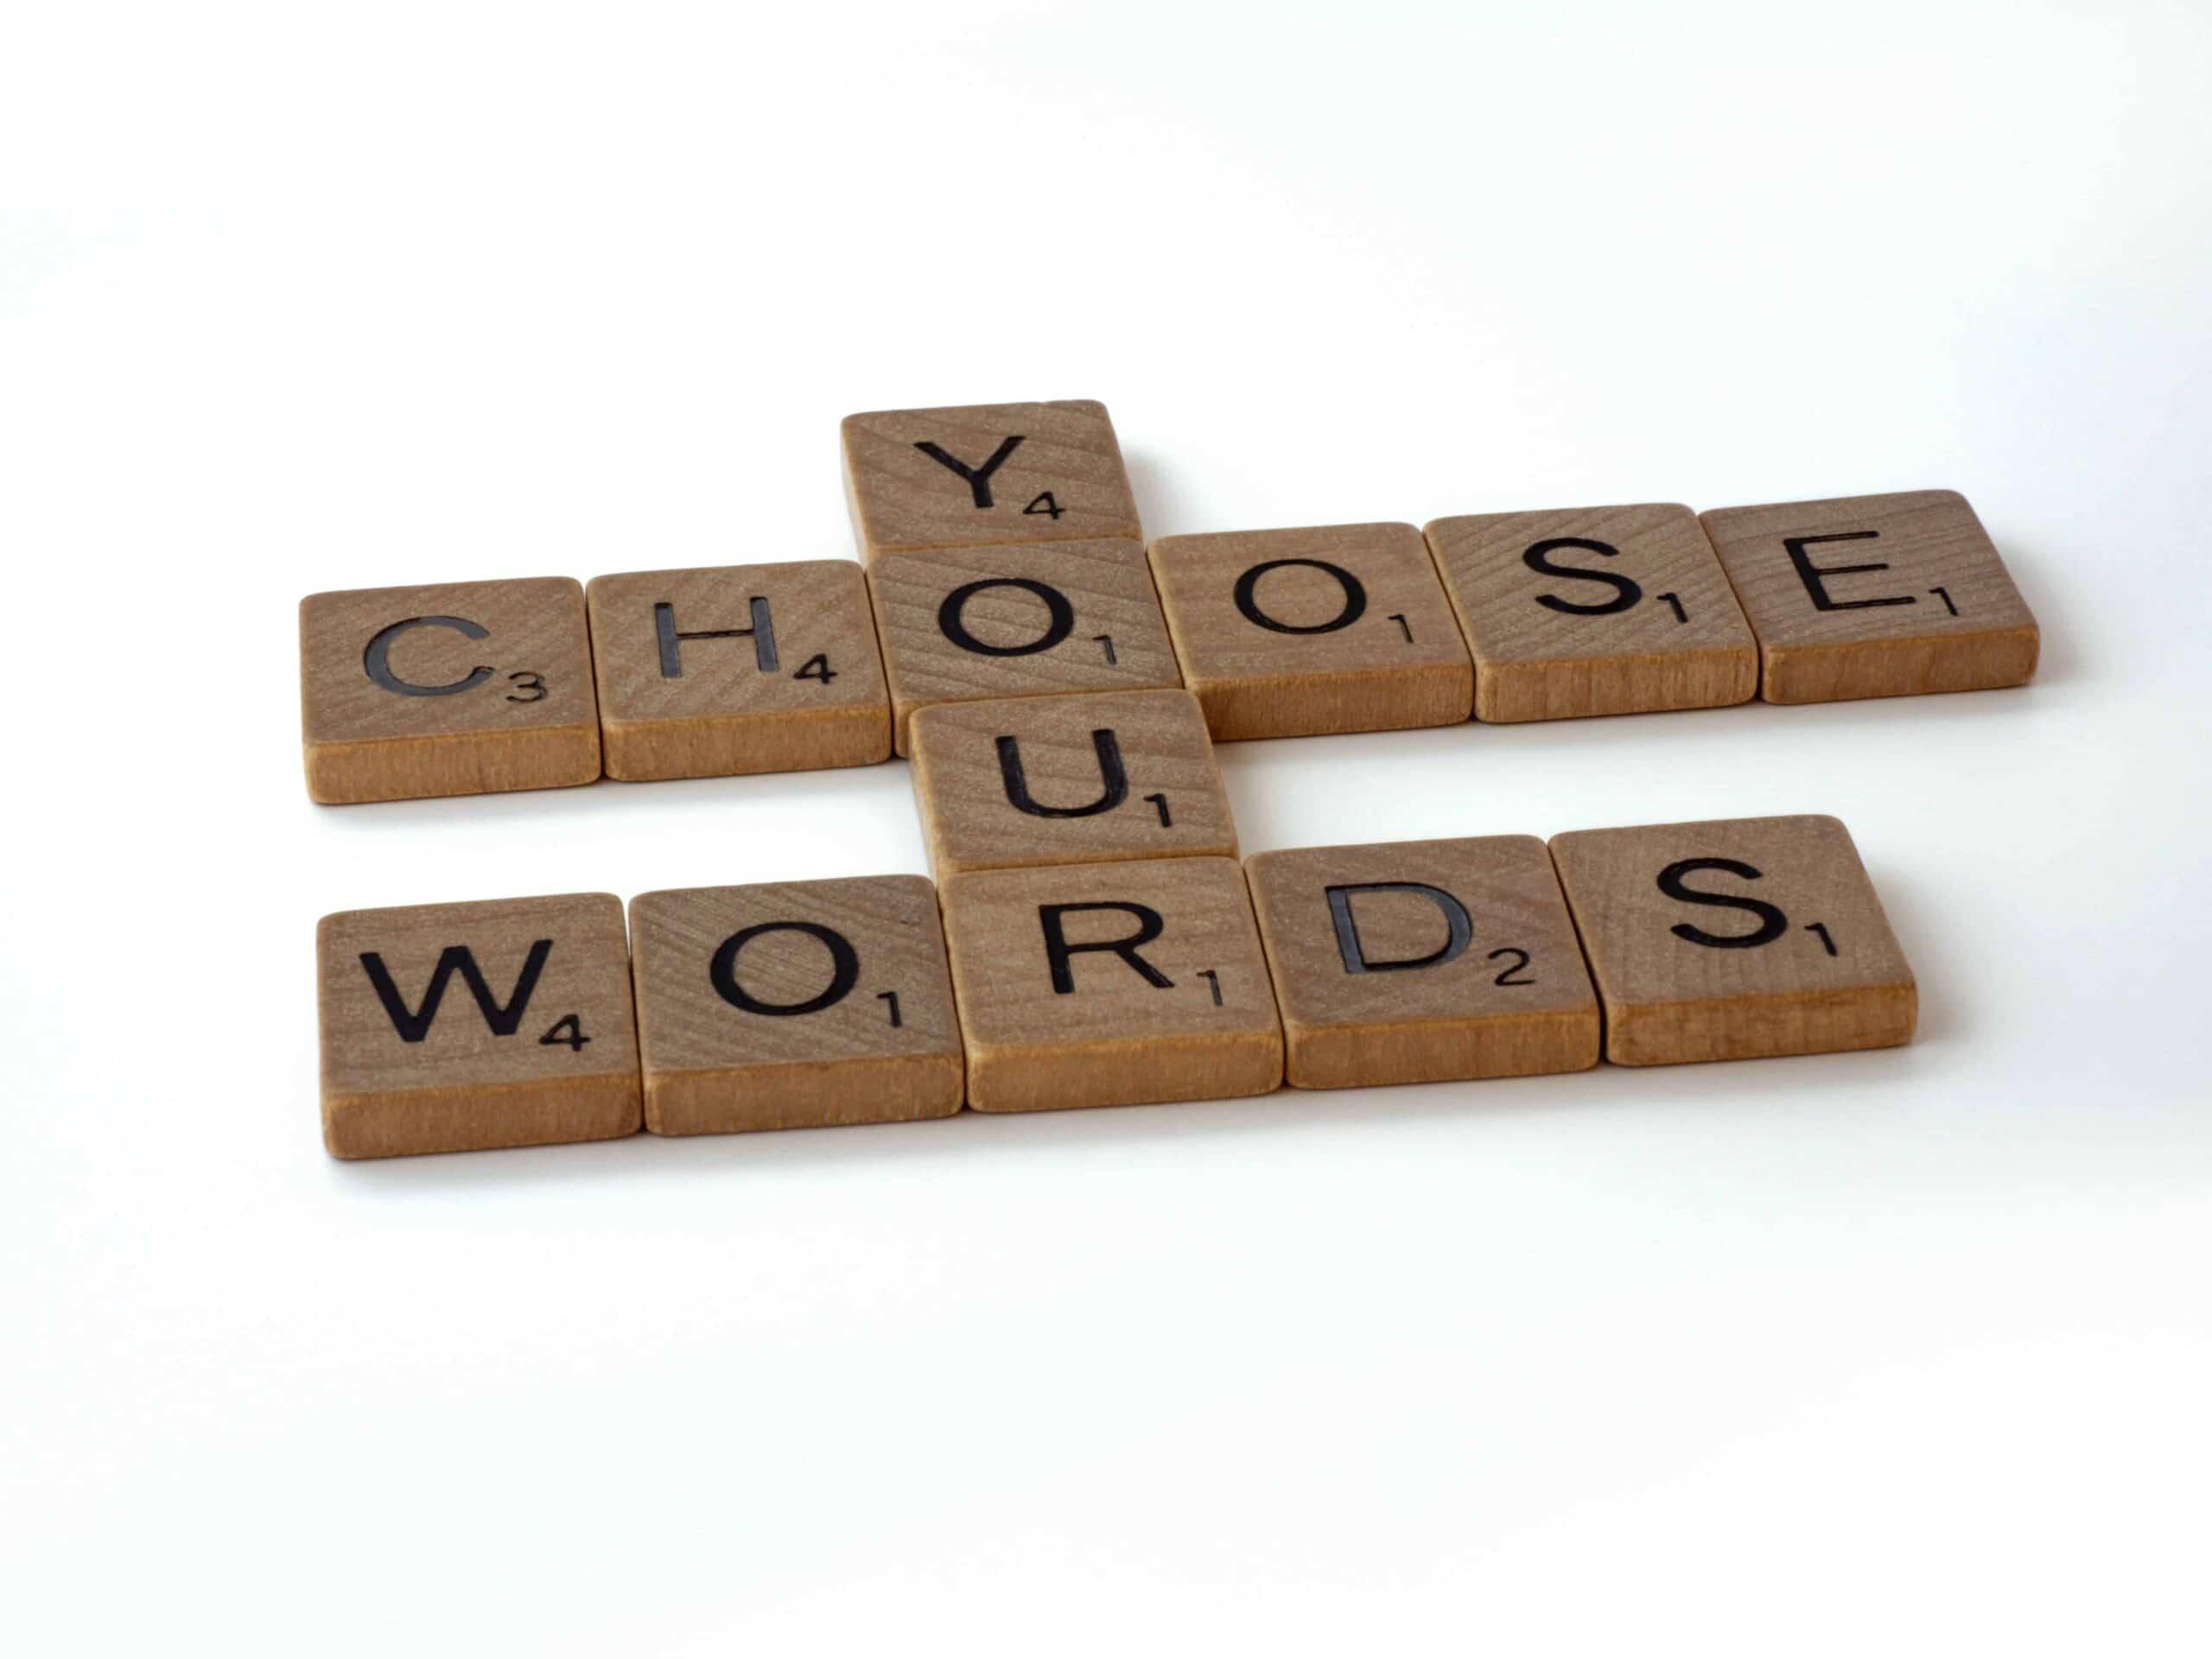 Cannibalization of keywords 2